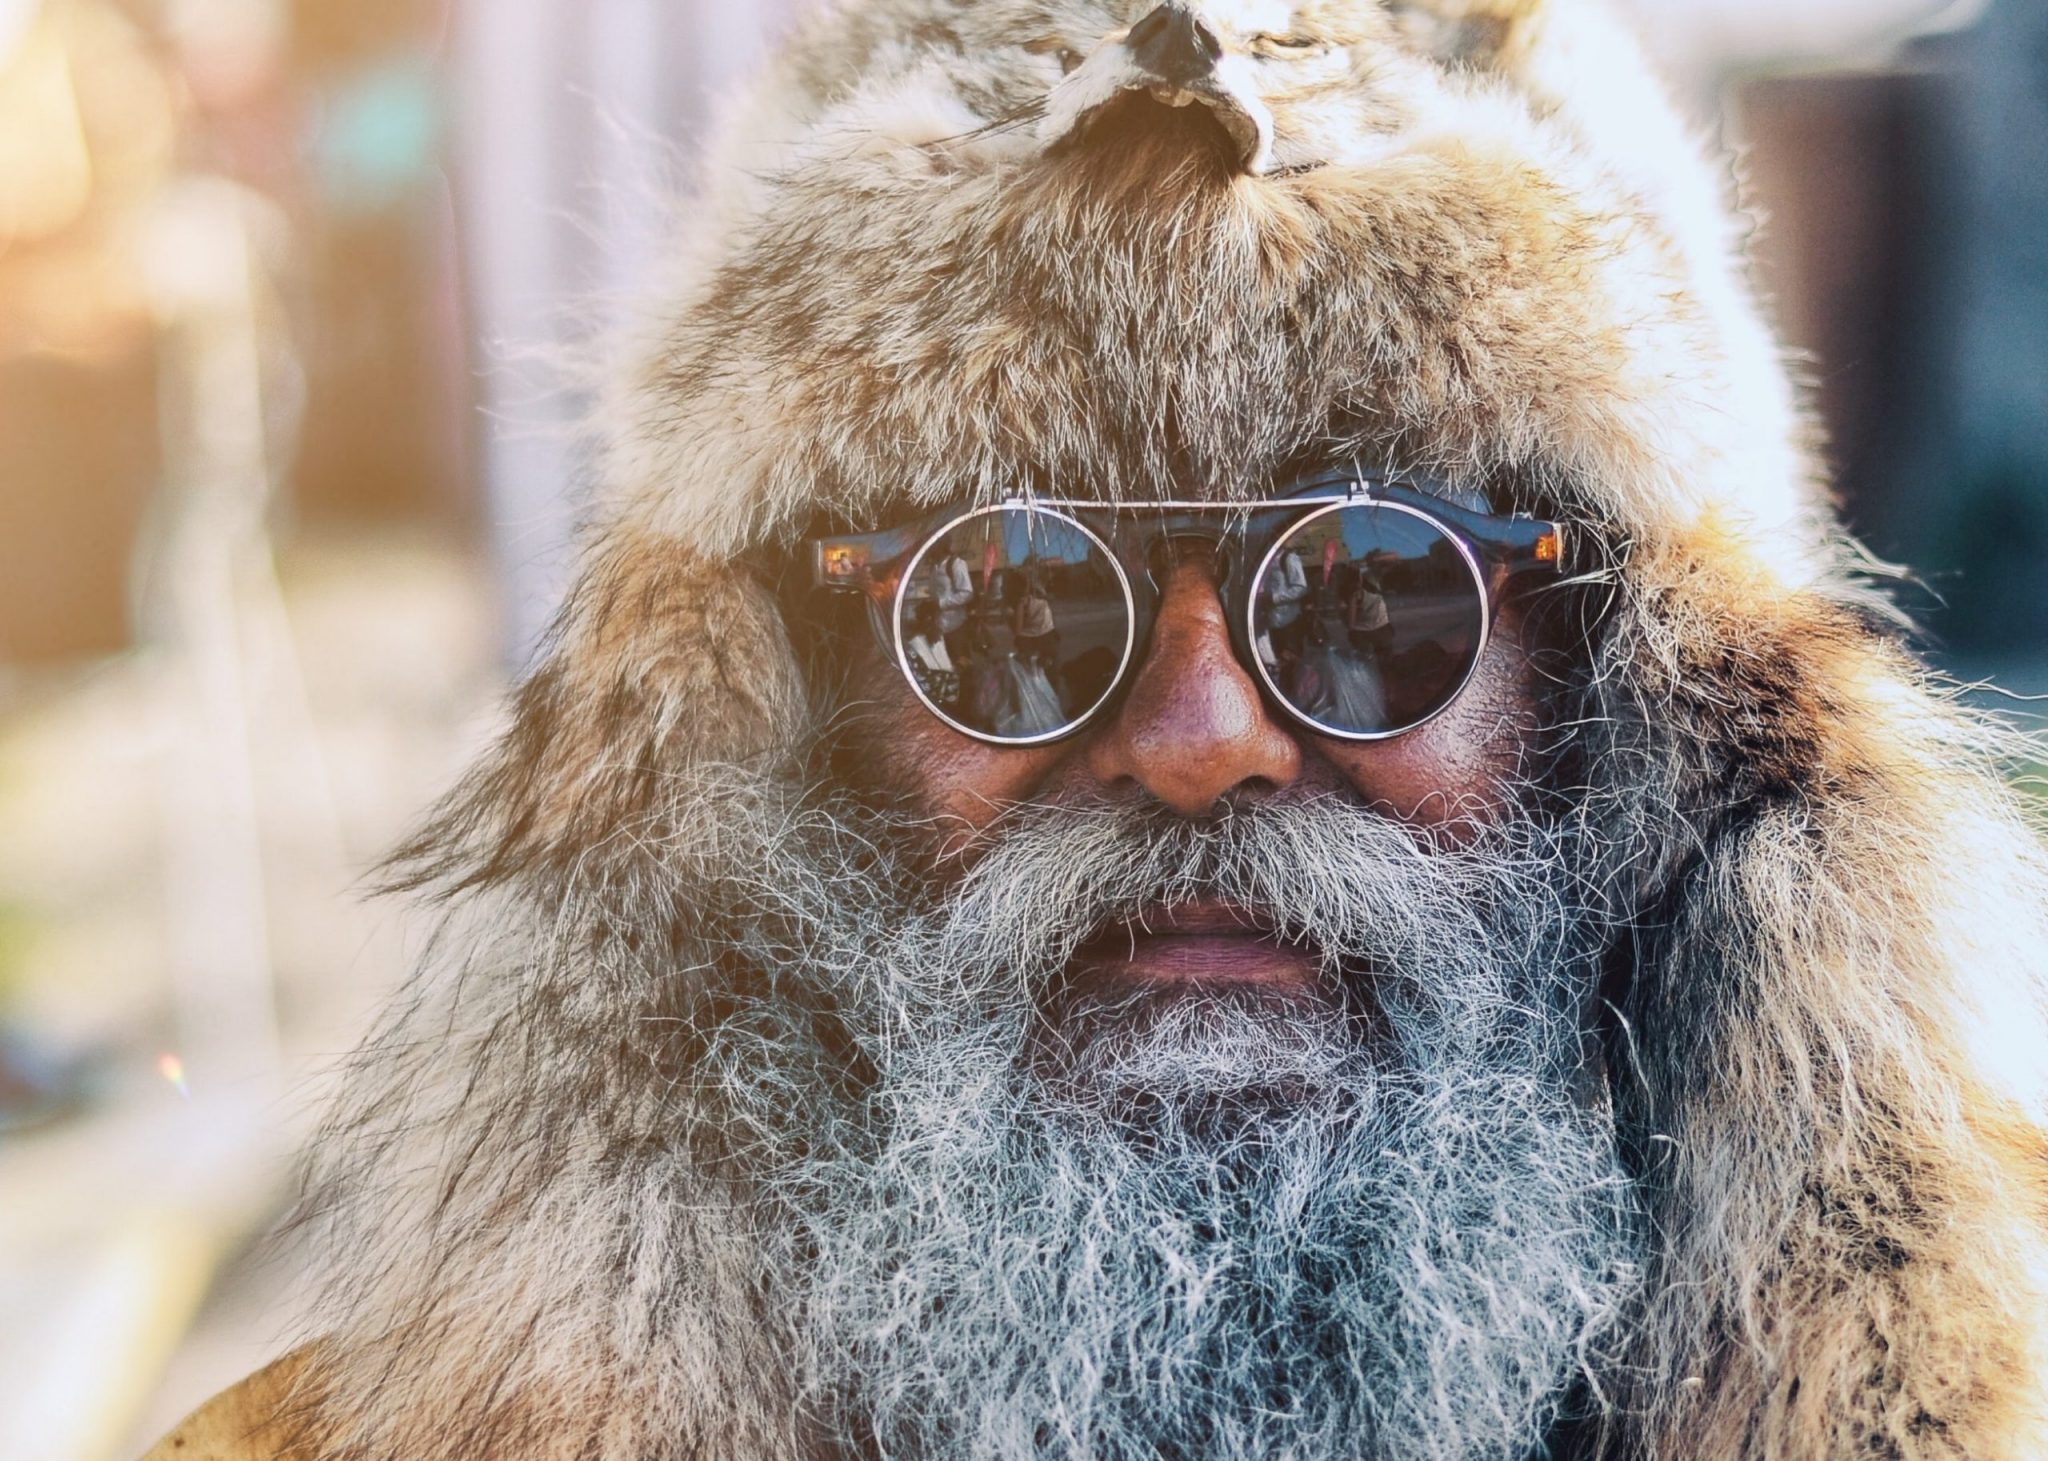 beard-brush-photoshop